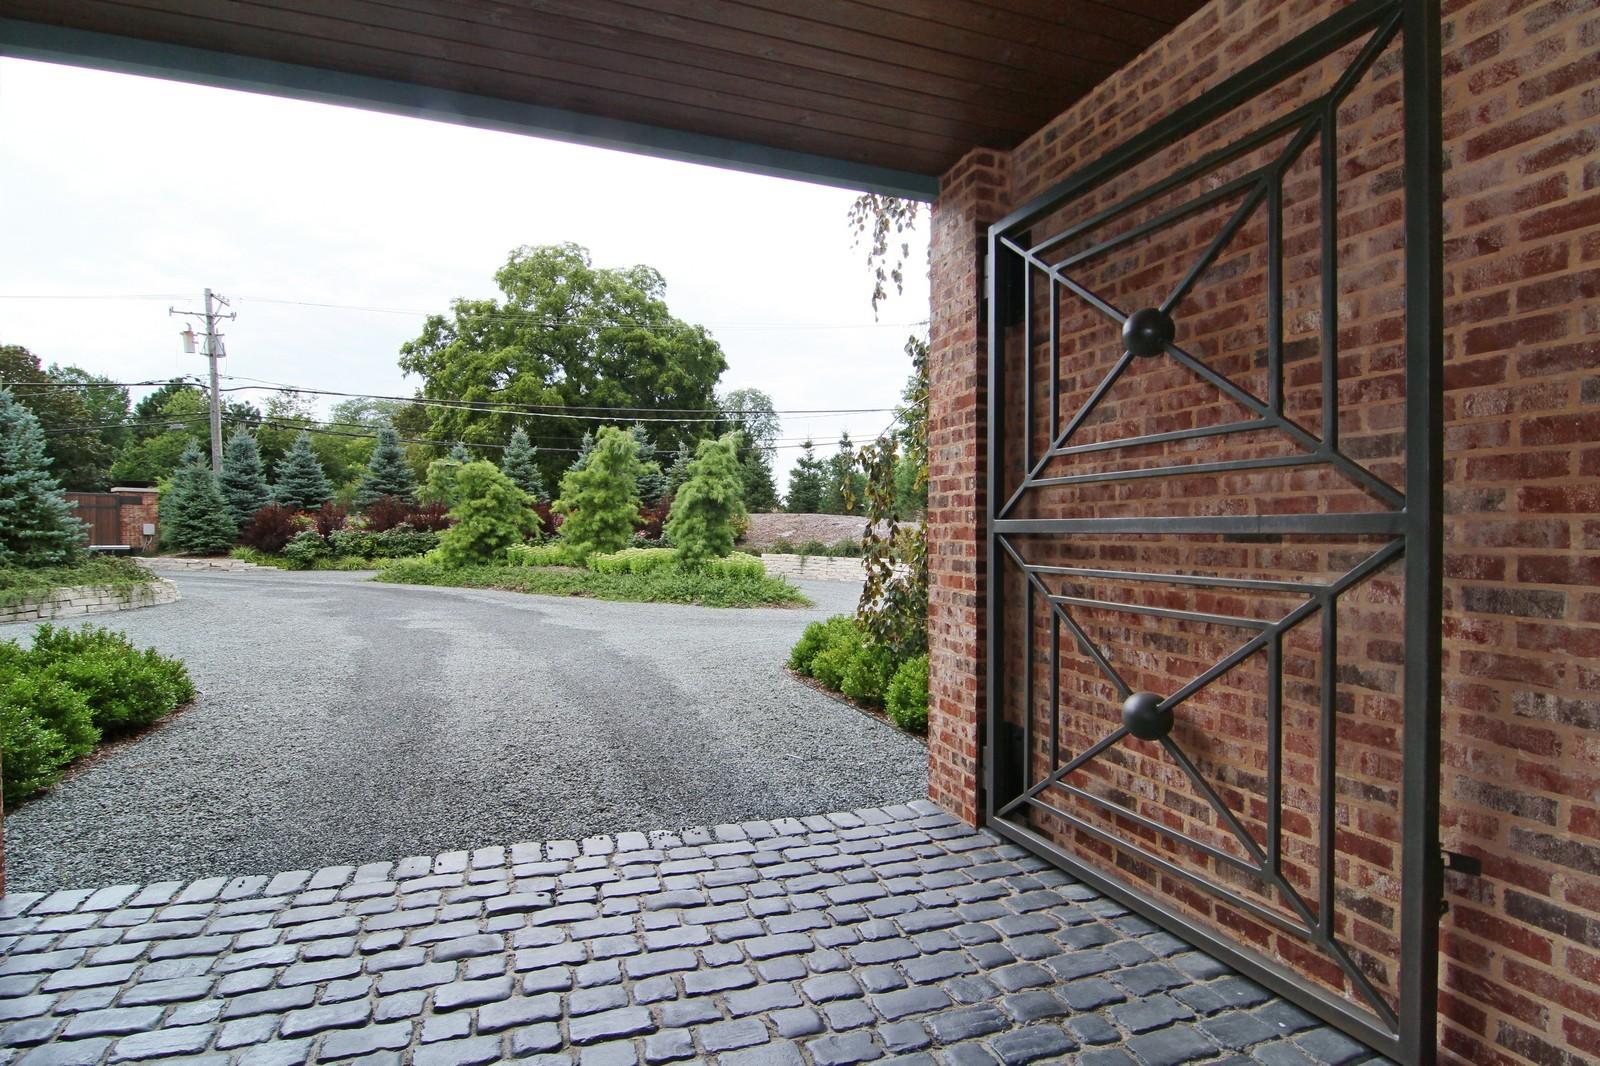 Real Estate Photography - 6143 Madison, Burr Ridge, IL, 60527 - View